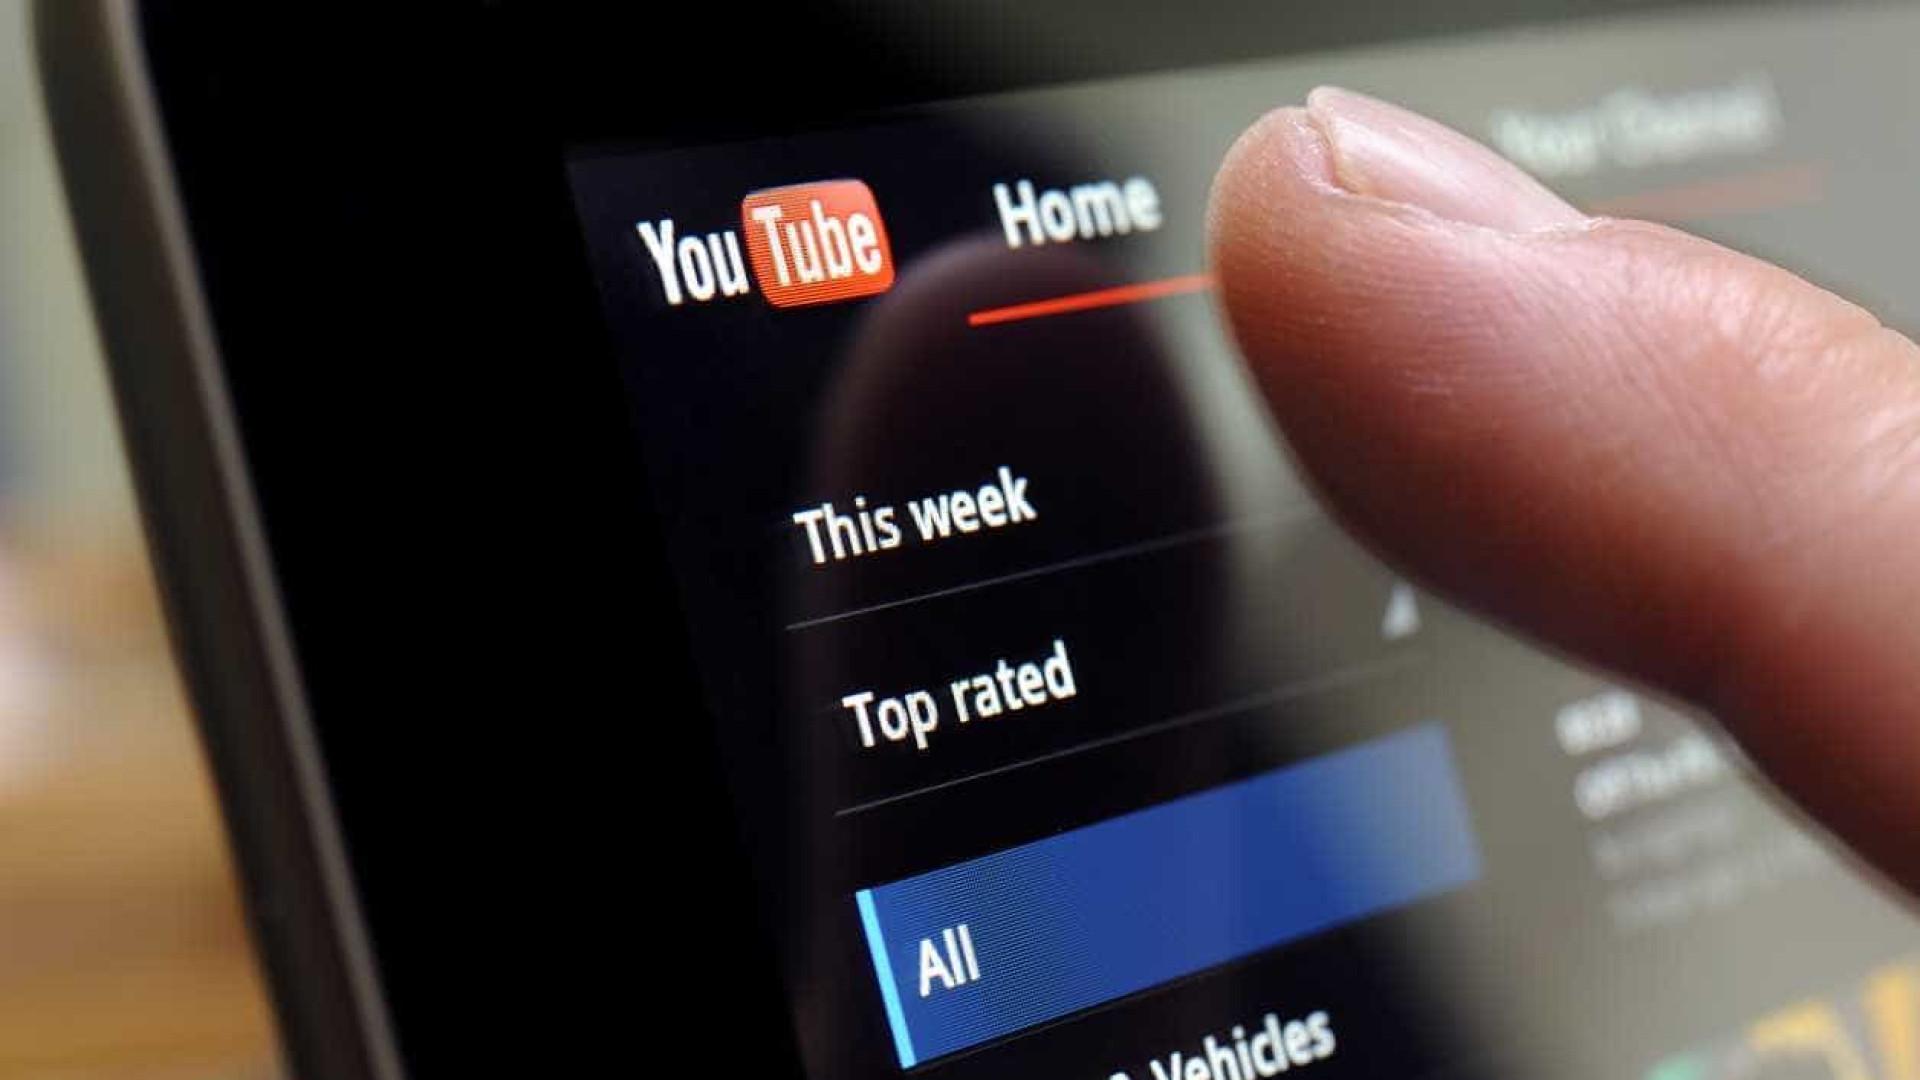 Conheça 4 medidas do YouTube para combater terrorismo online